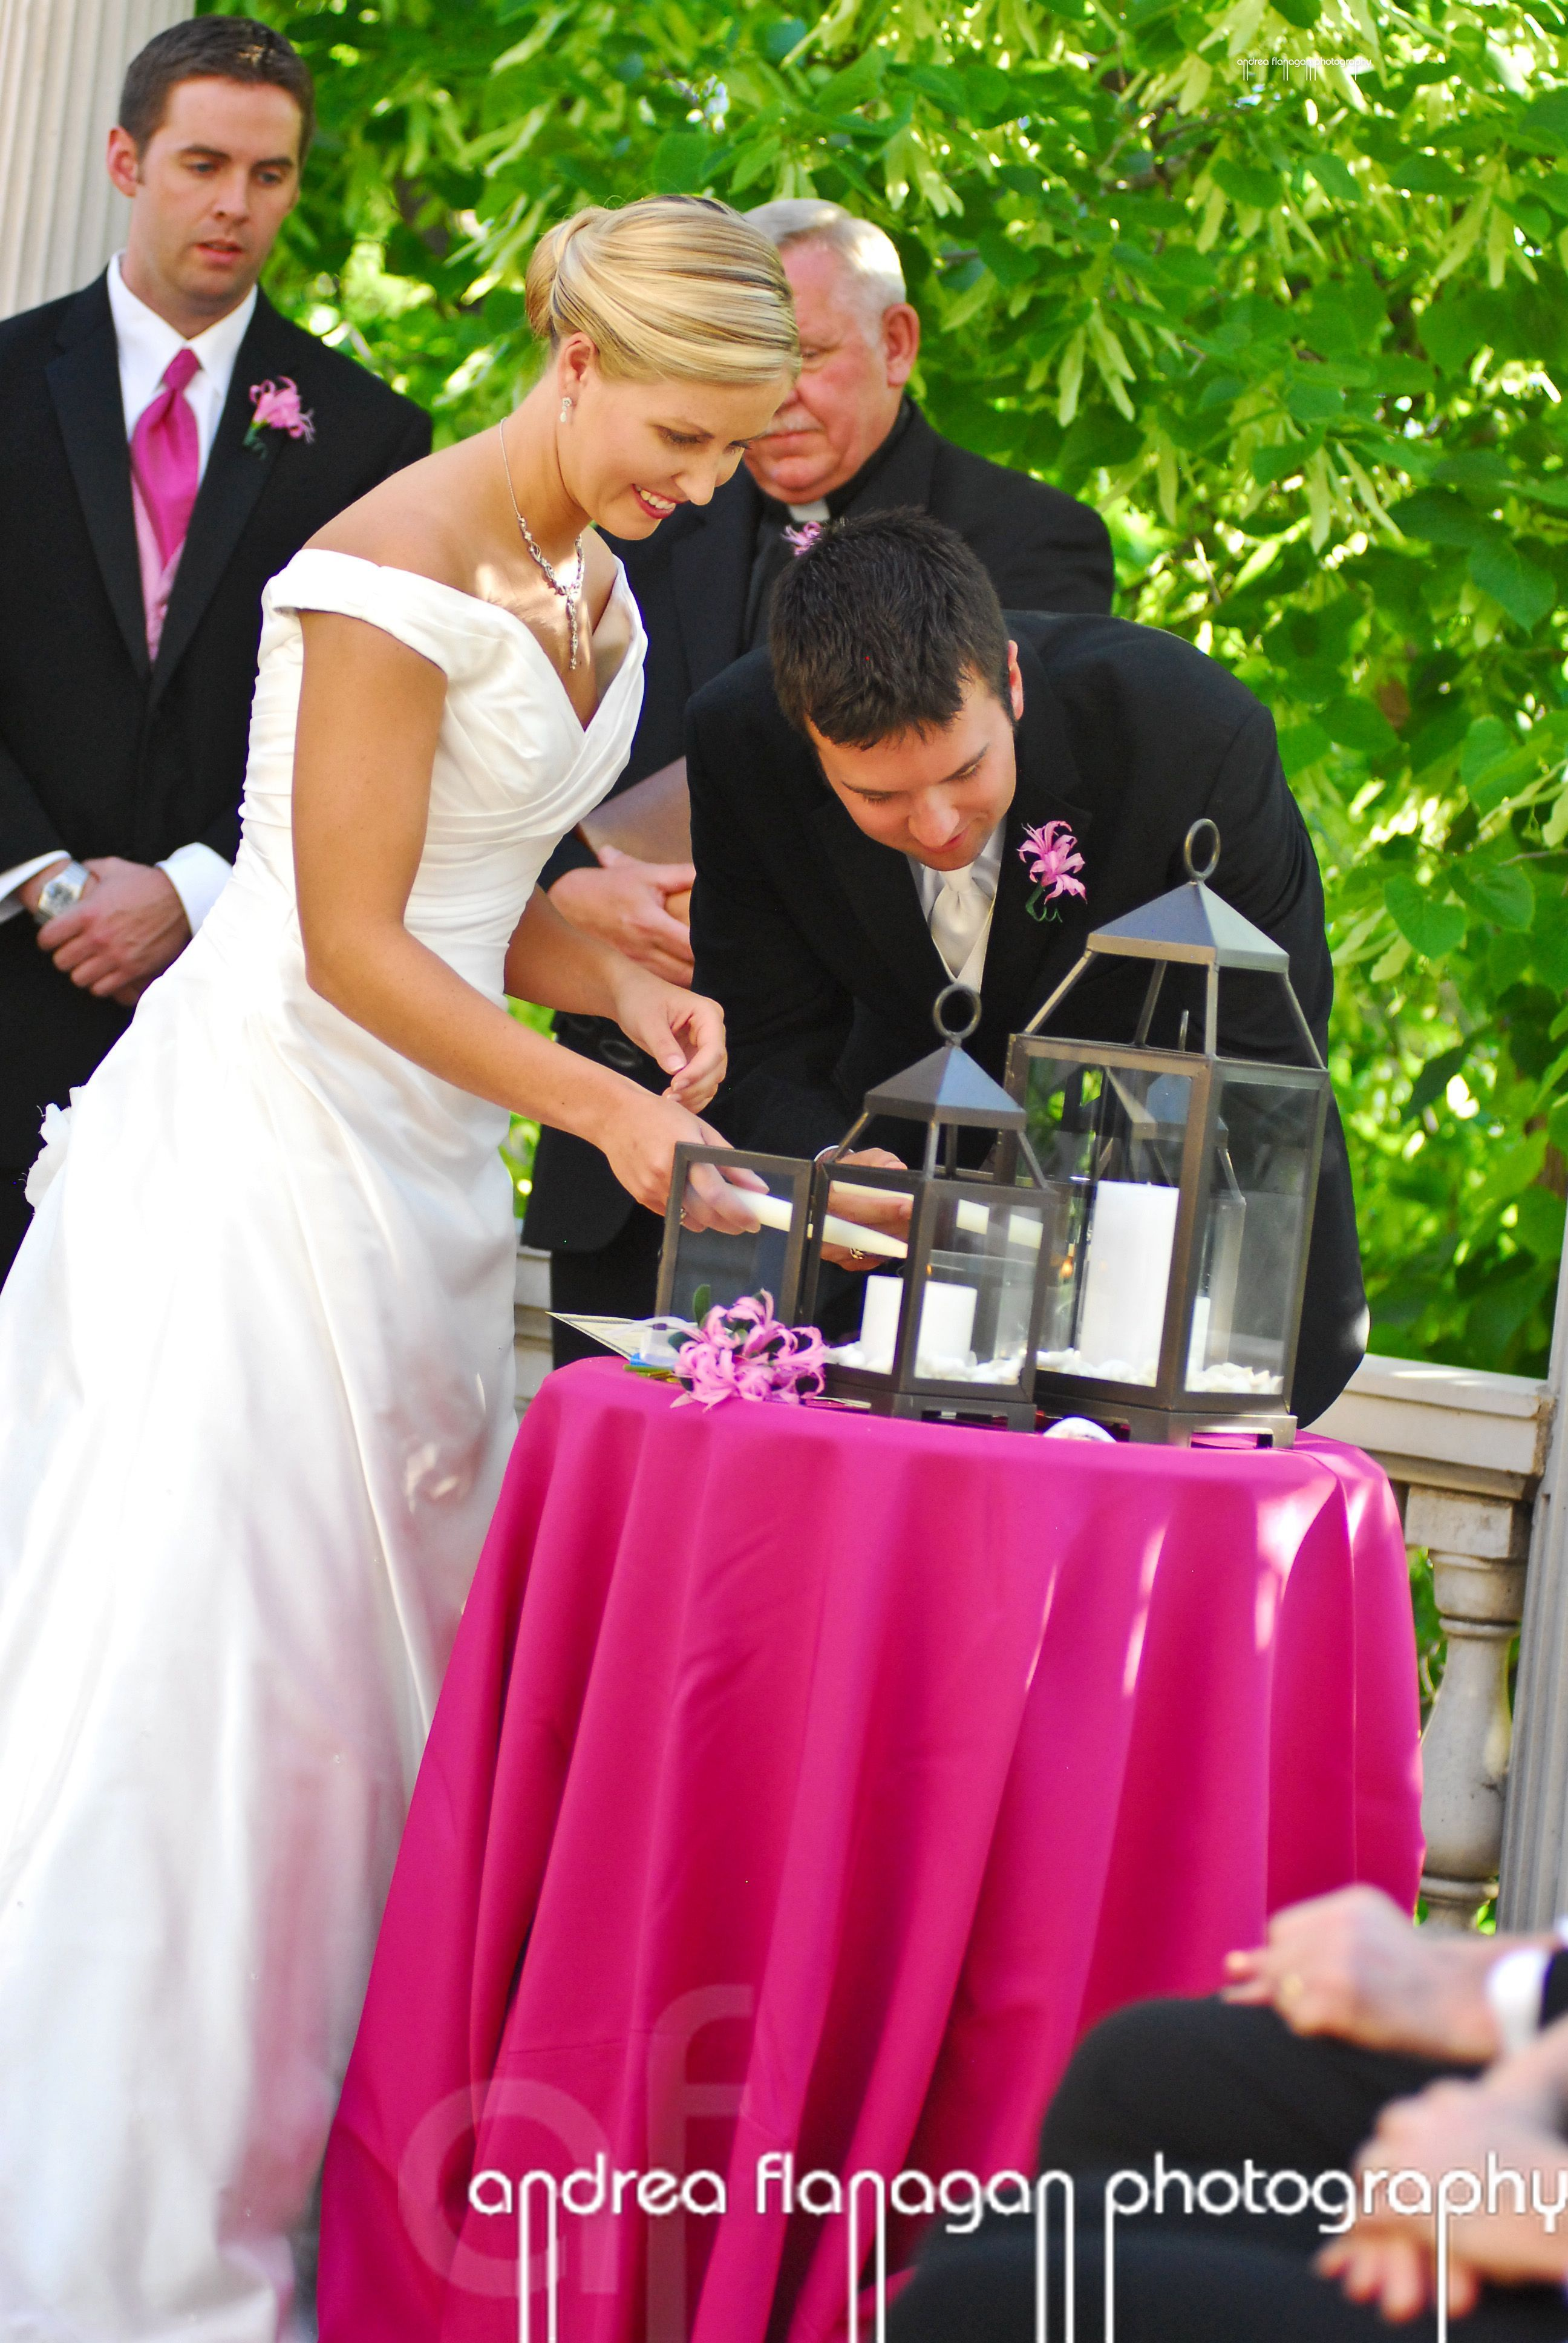 pink, Candle, Unity candle, Unity, Pink wedding, Custom weddings of colorado, Mansion wedding, Denver wedding